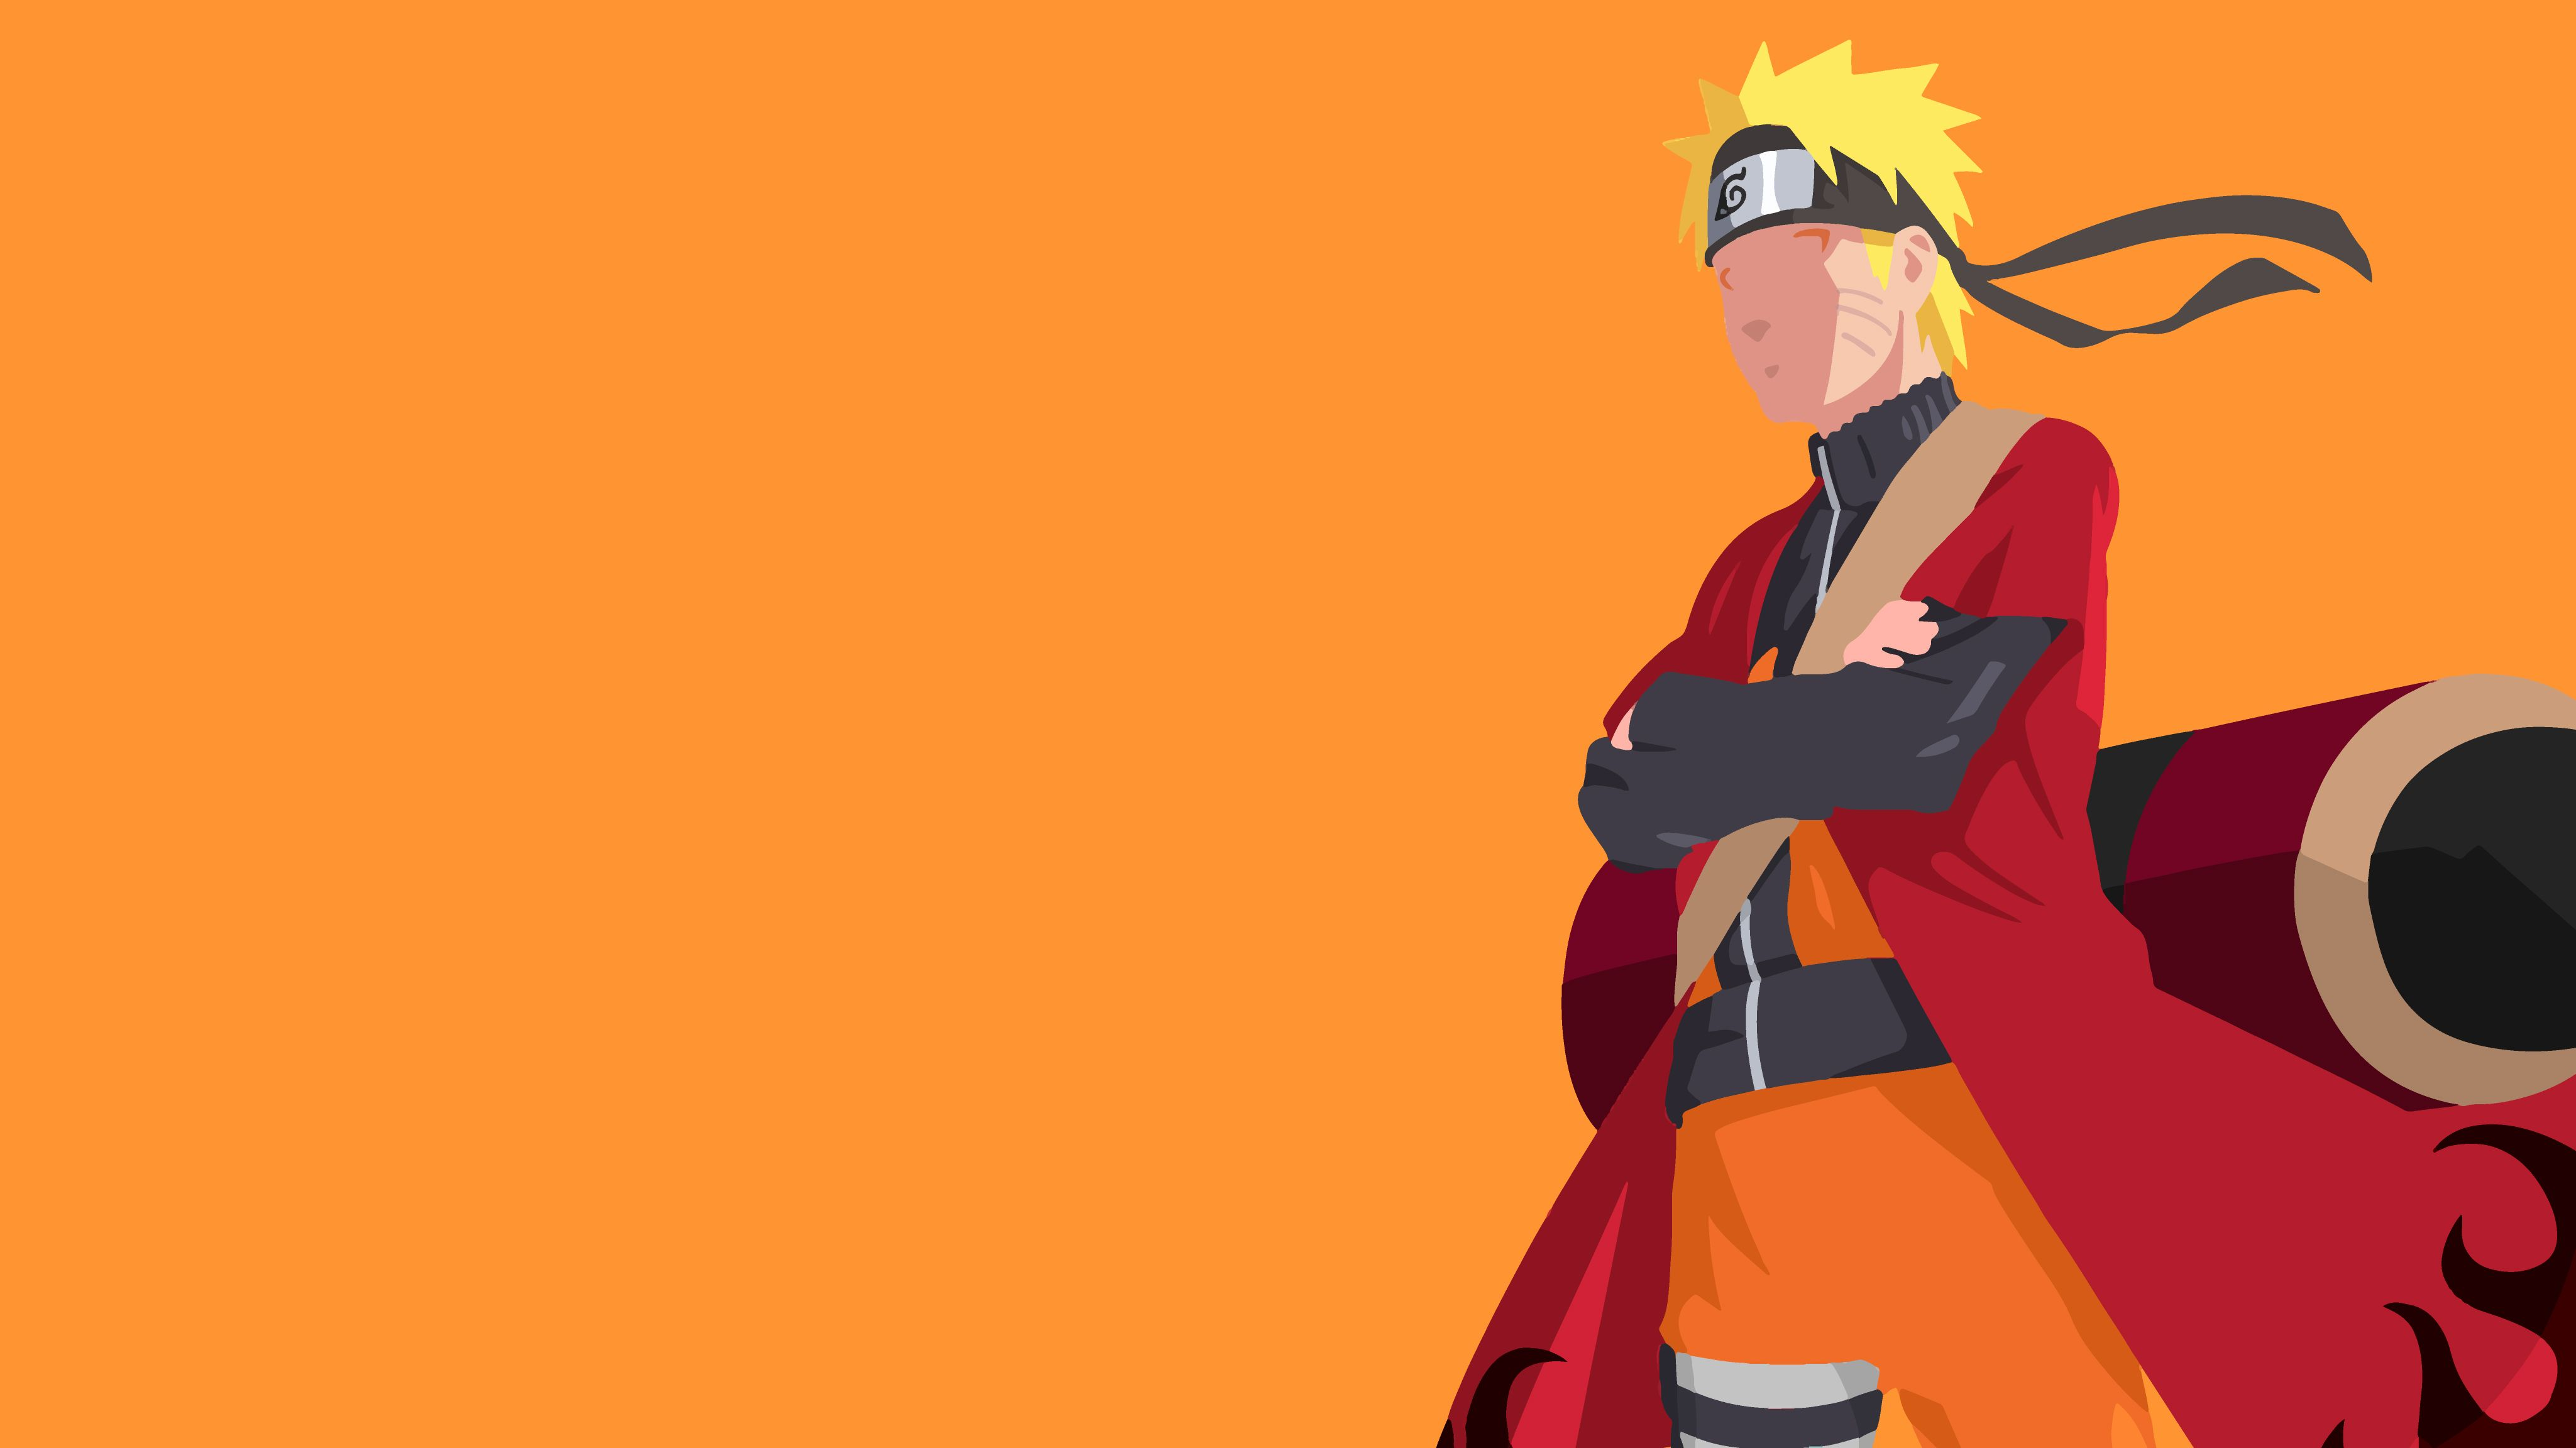 Pin By Saih07 On Fondos Pc Best Naruto Wallpapers Naruto Wallpaper Anime Wallpaper Live